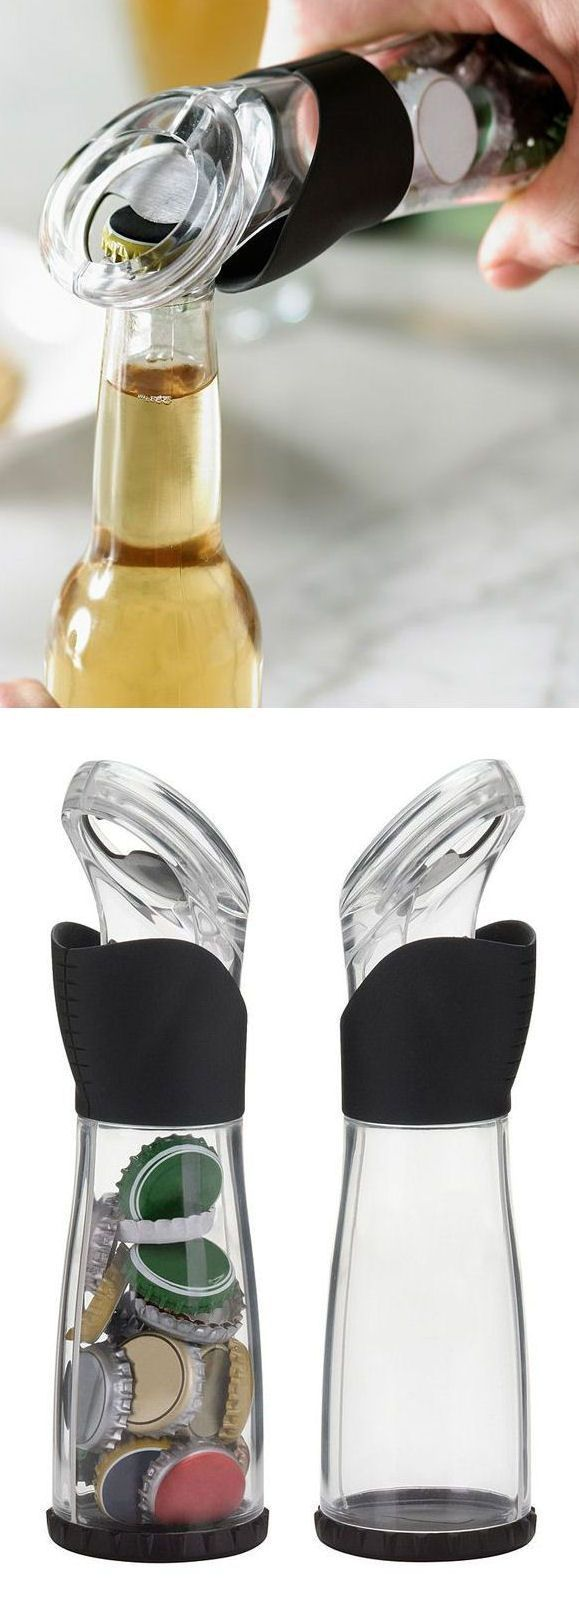 Funny grab shaped multi purpose fruits vegetable peeler bottle opener - Fashionable Cap Storing Bottle Opener With Creative Design